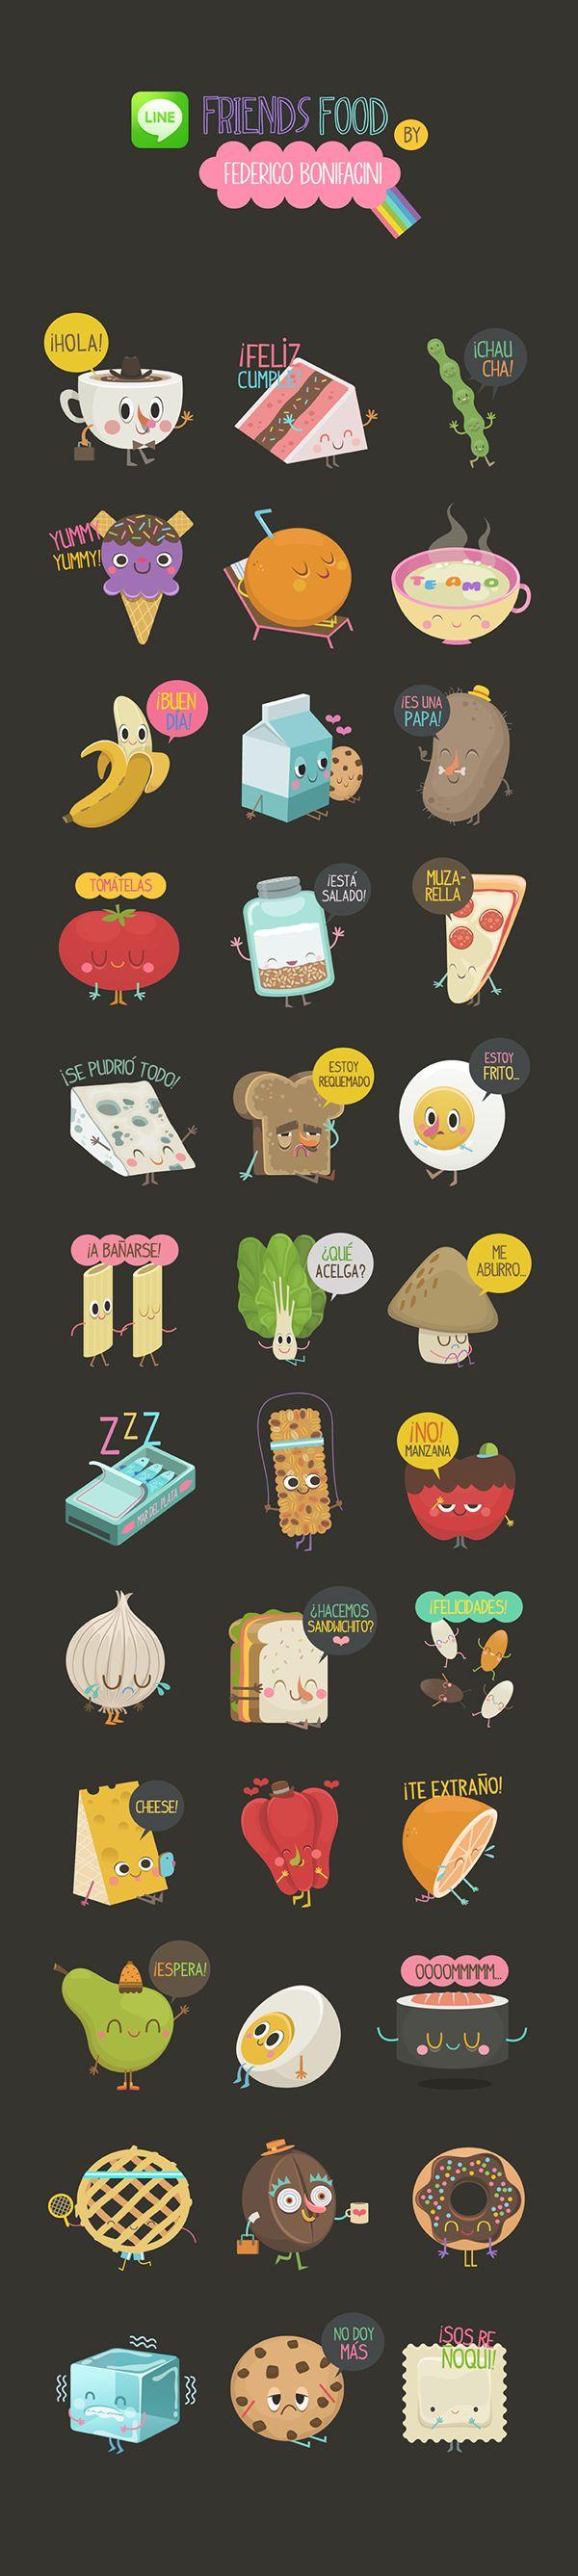 cute food icon design